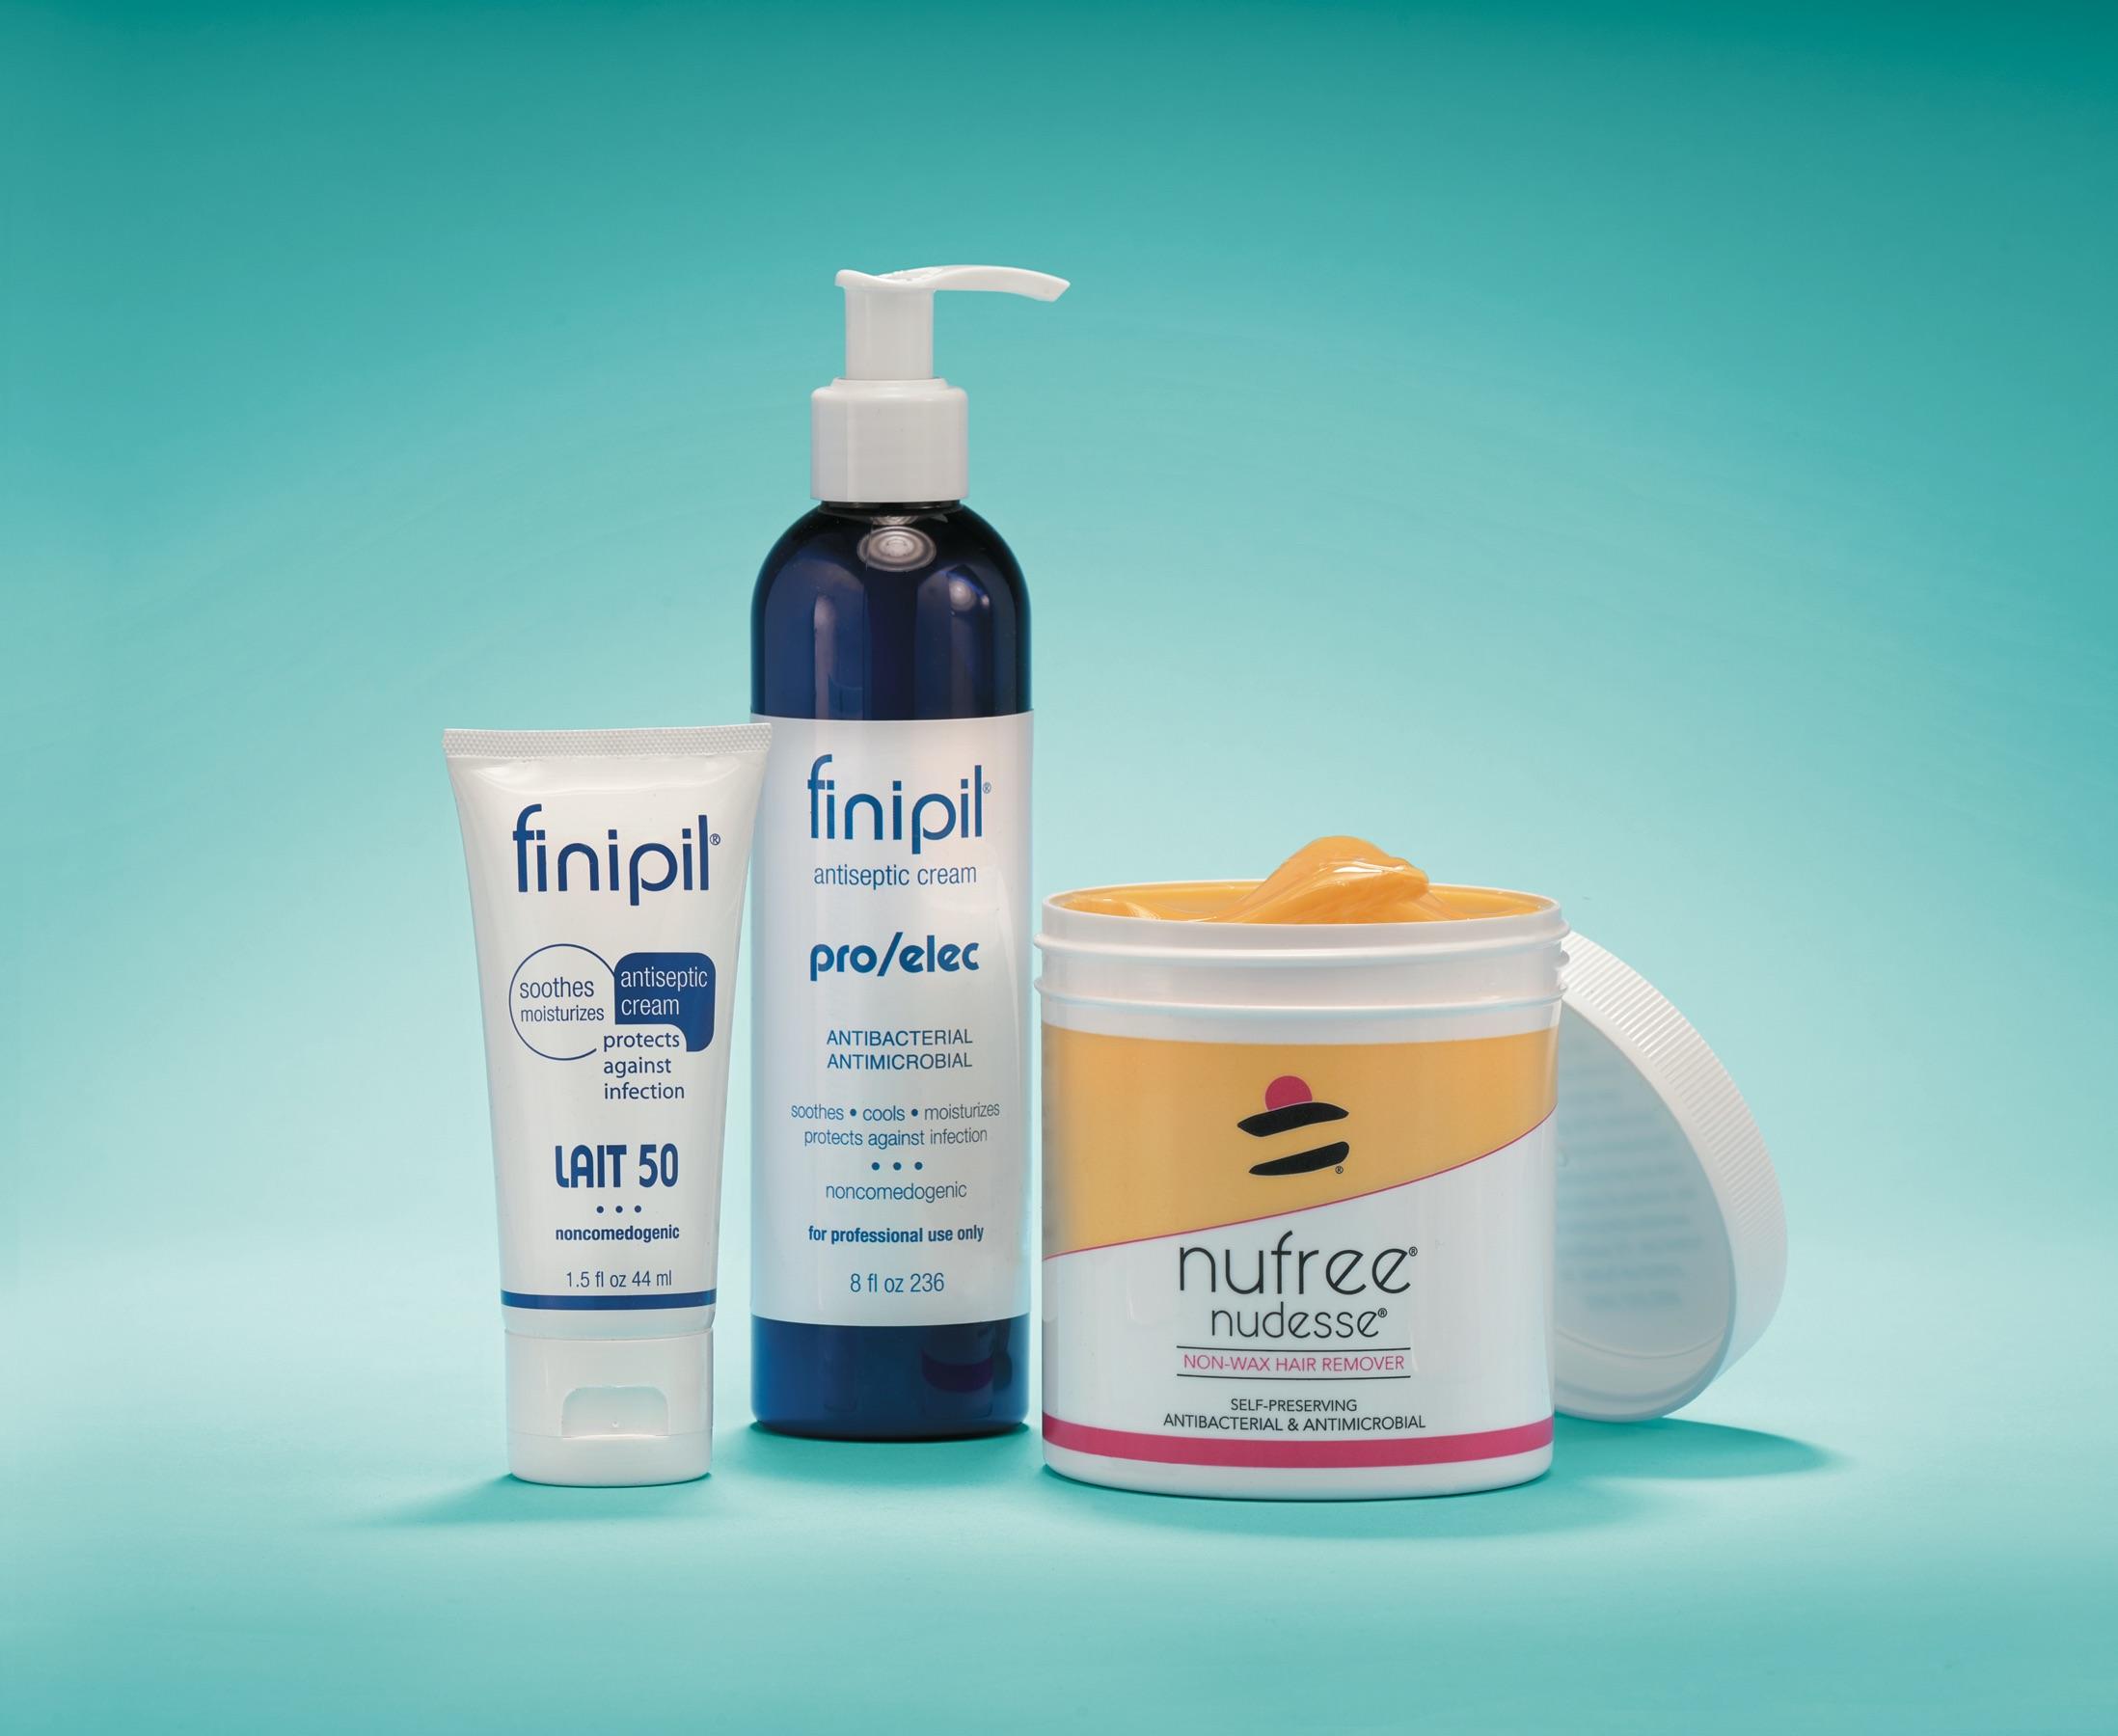 Favorite Hair Removal Line: Nufree Nudesse/Finipil